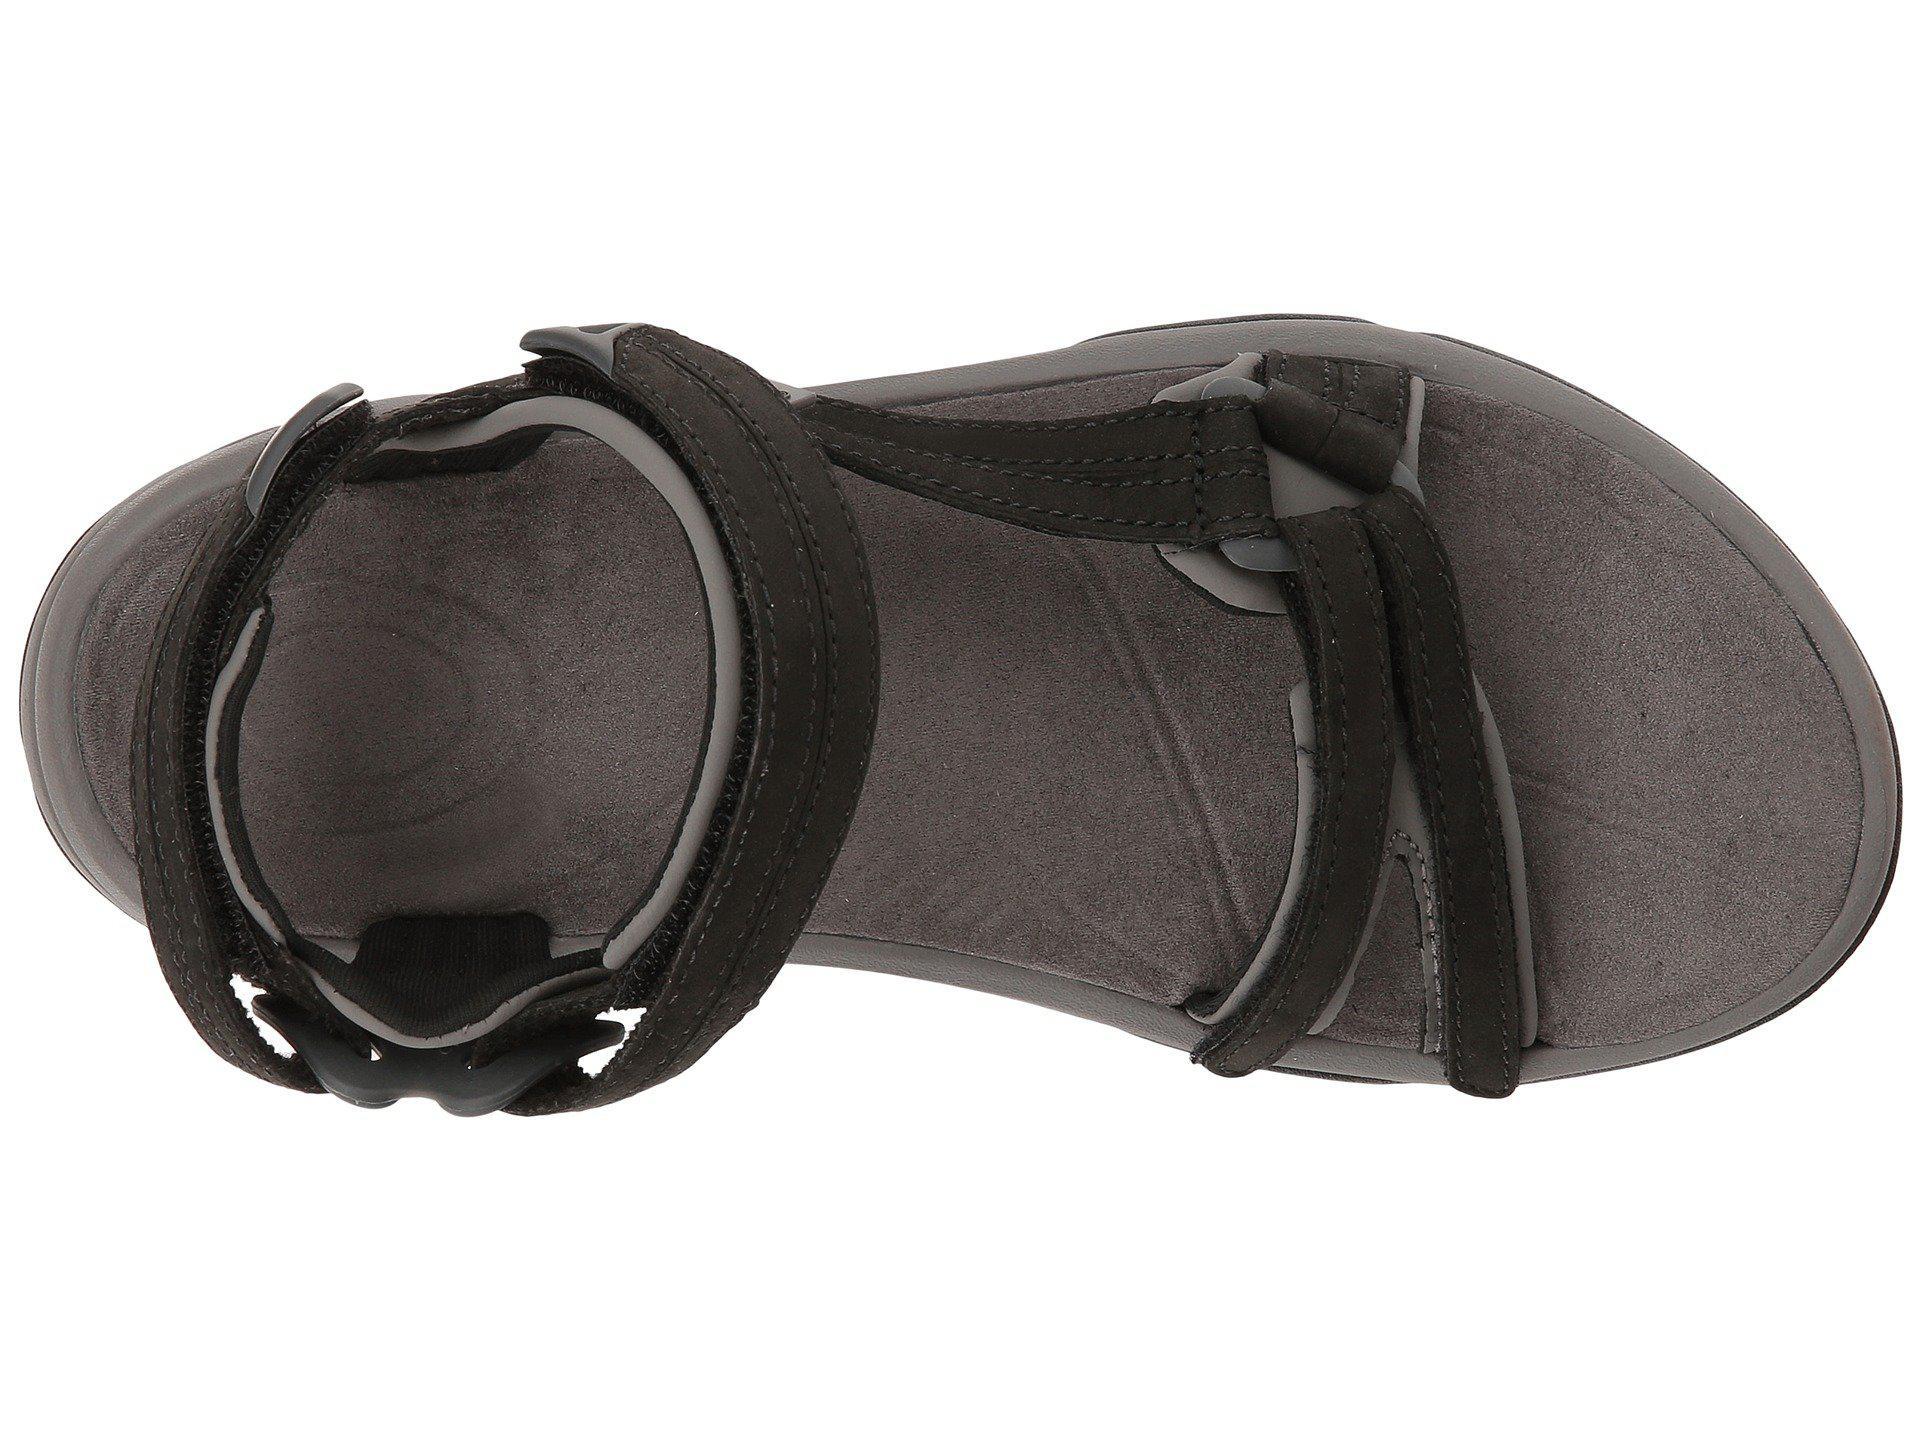 8b0b2da8e Teva - Terra Fi Lite Leather (black) Women s Shoes - Lyst. View fullscreen